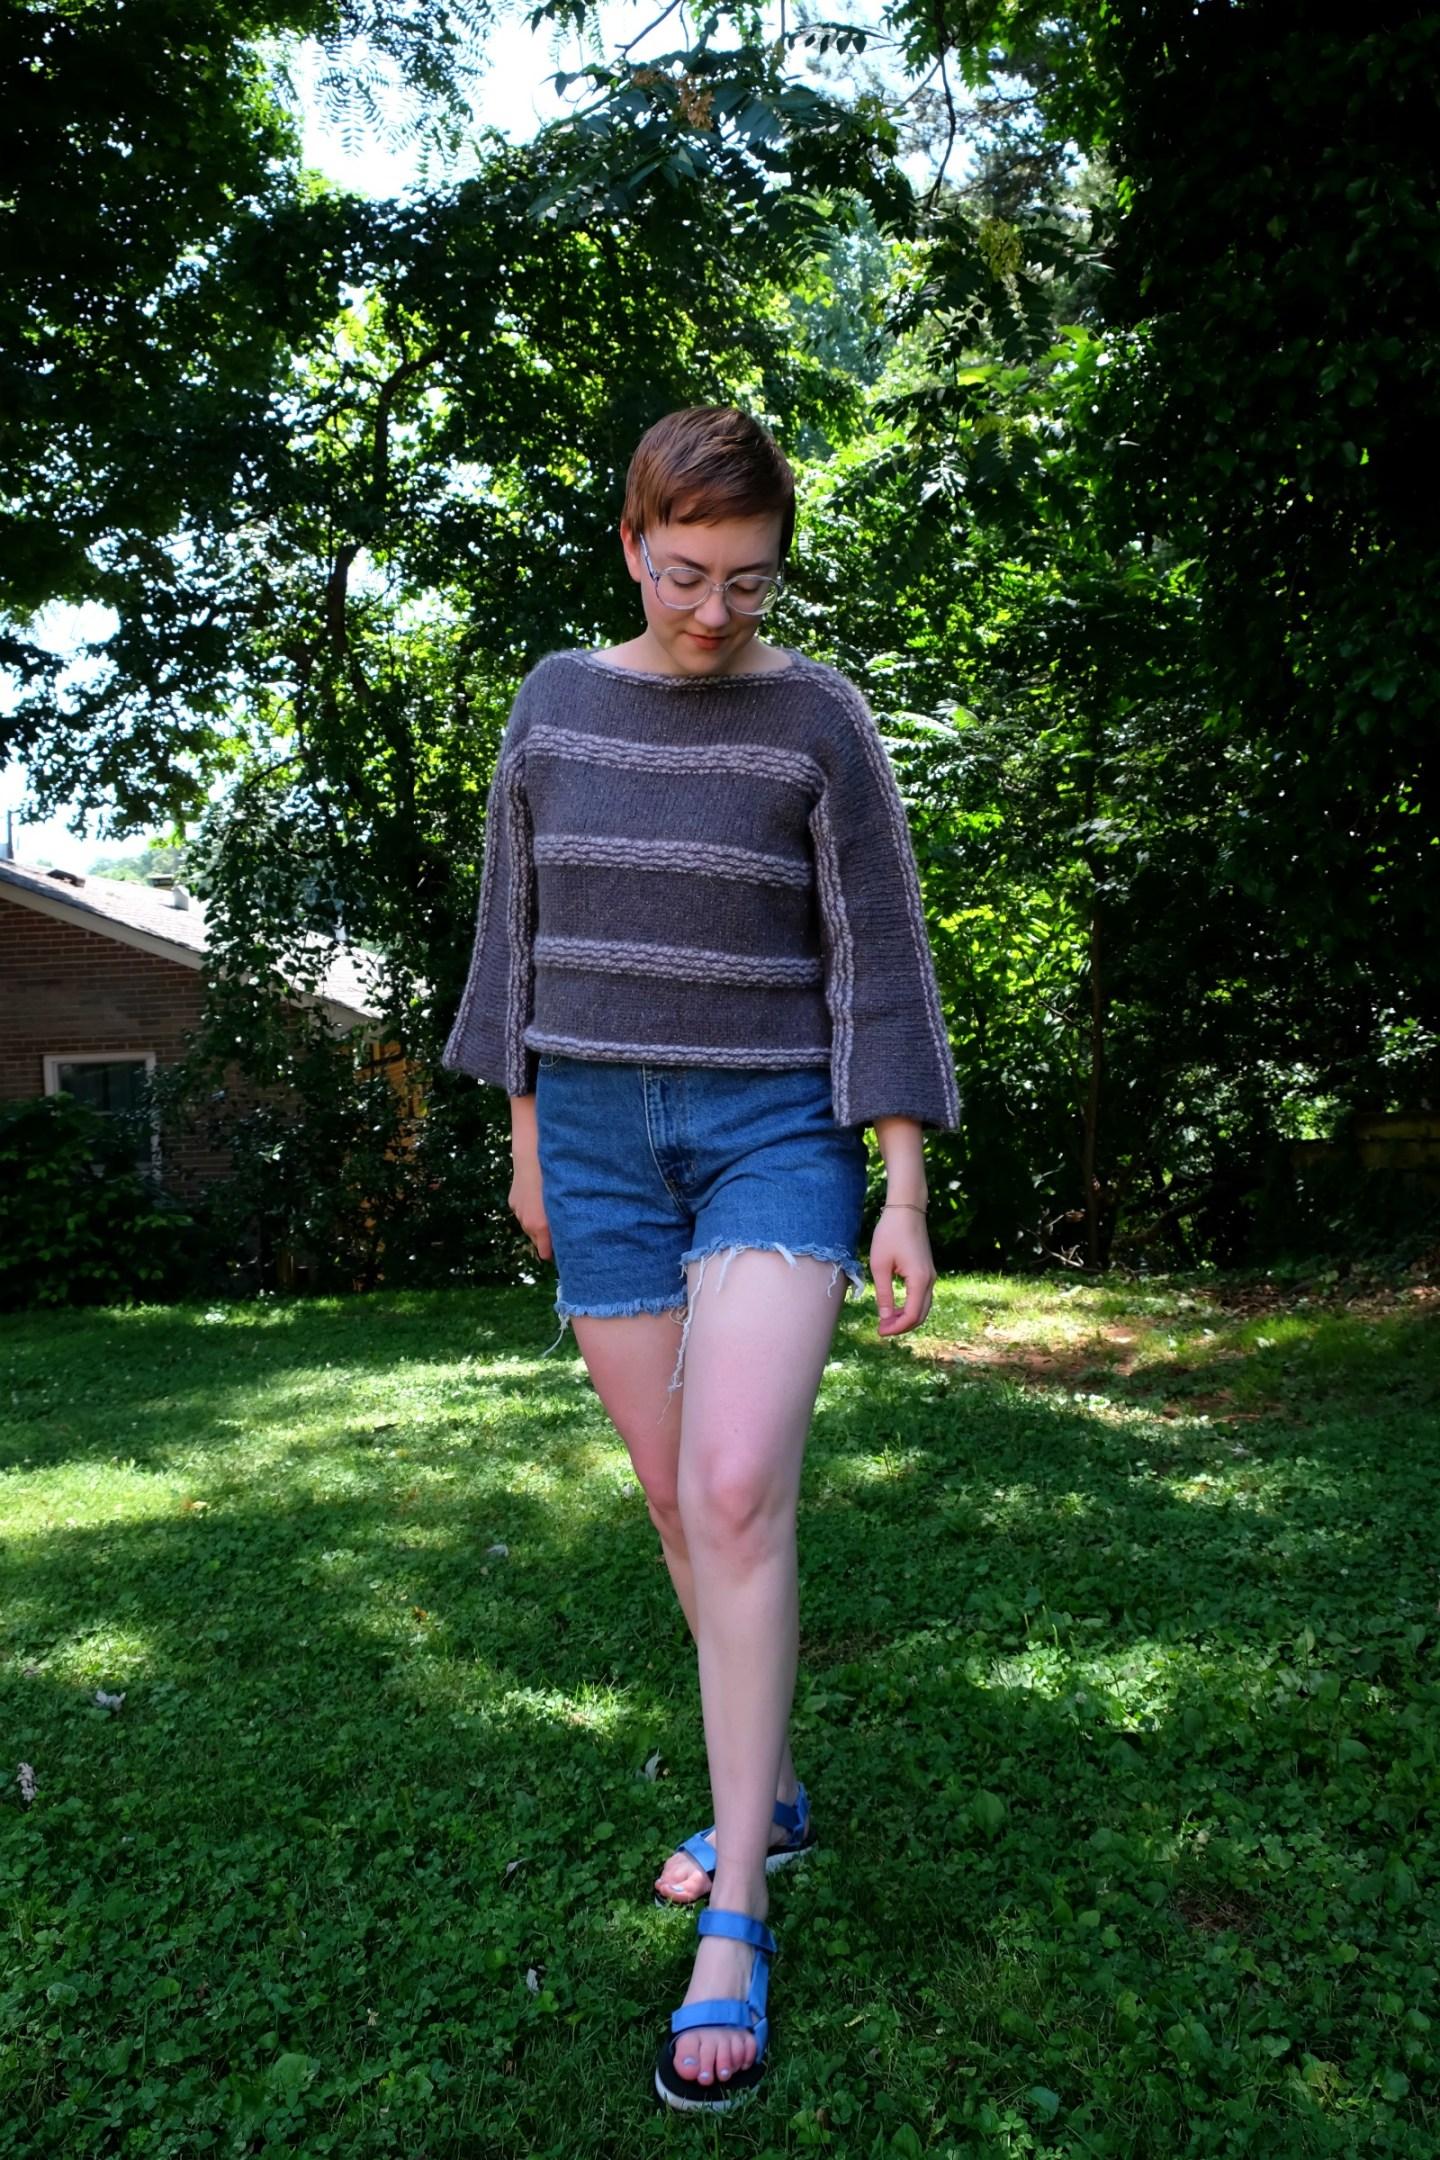 Ethical Details: Sweater - c/o  Mantari ; Shorts - thrifted ( similar ); Sandals - Teva (secondhand via  ebay )